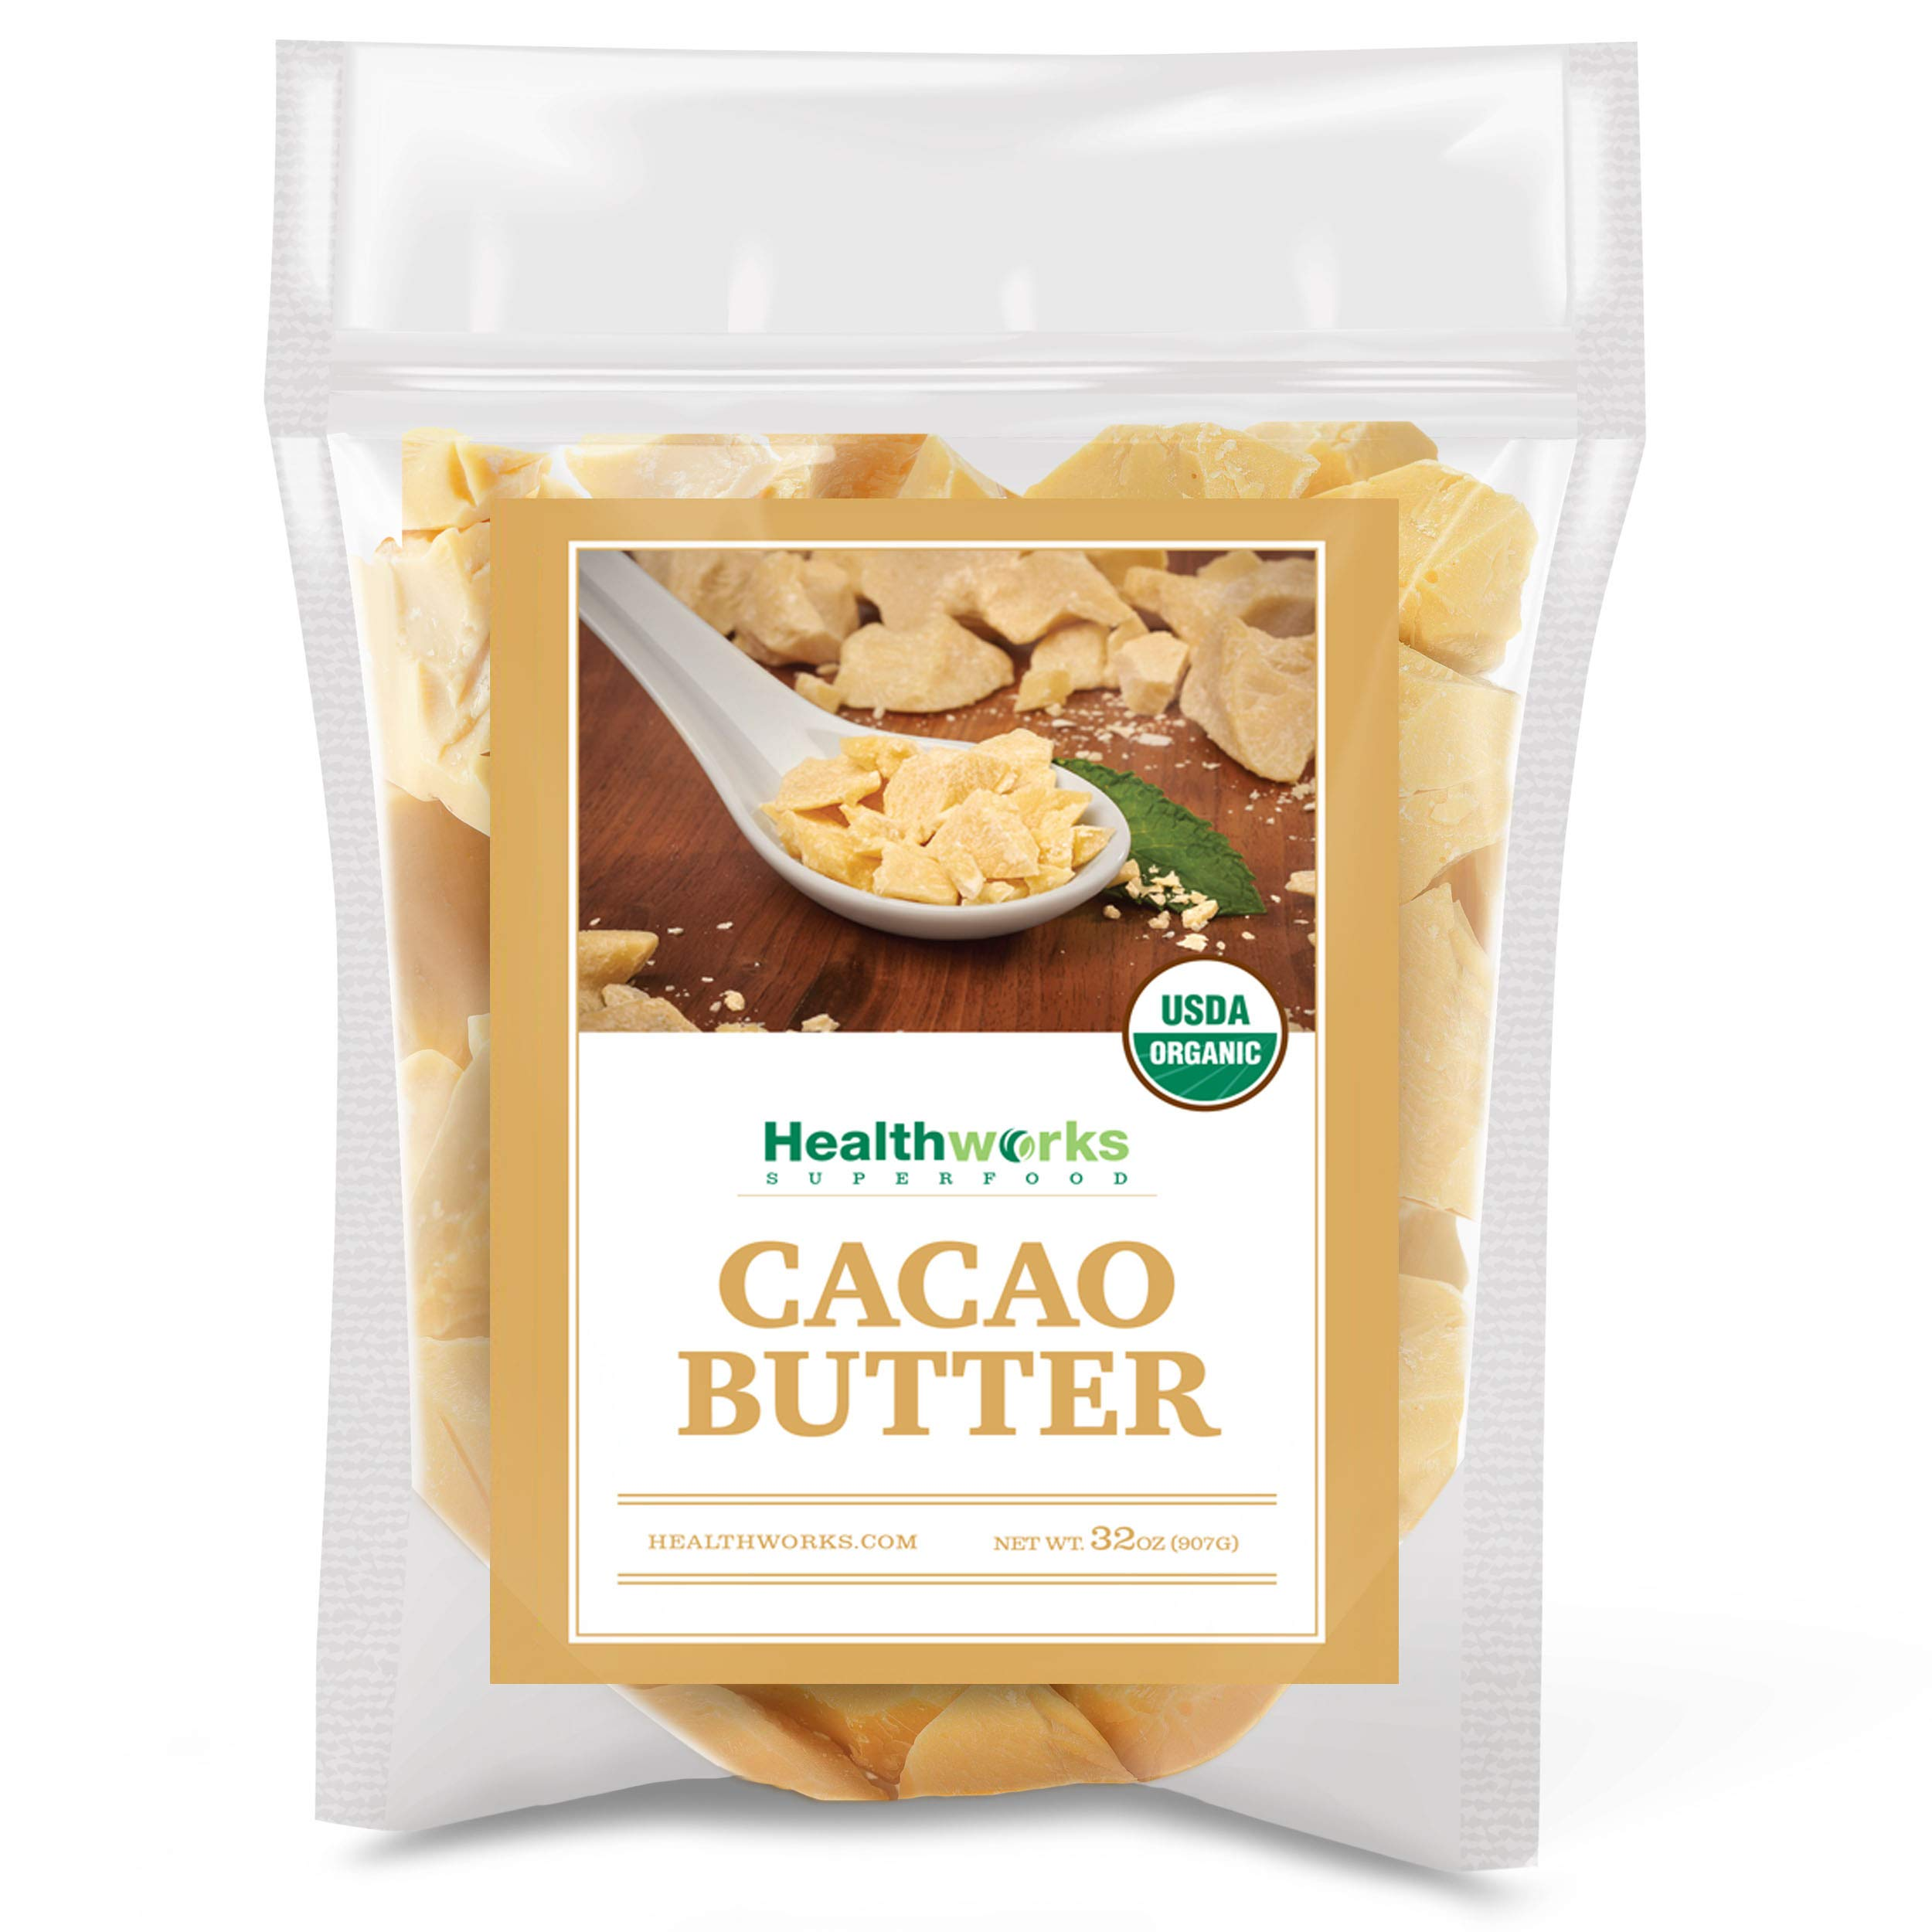 Healthworks Cacao Butter (32 Ounces / 2 Pounds) Organic   Unrefined Non-Deodorized Cocoa   Certified Organic from Peru   Sugar-Free, Keto, Vegan & Non-GMO   Antioxidant Superfood